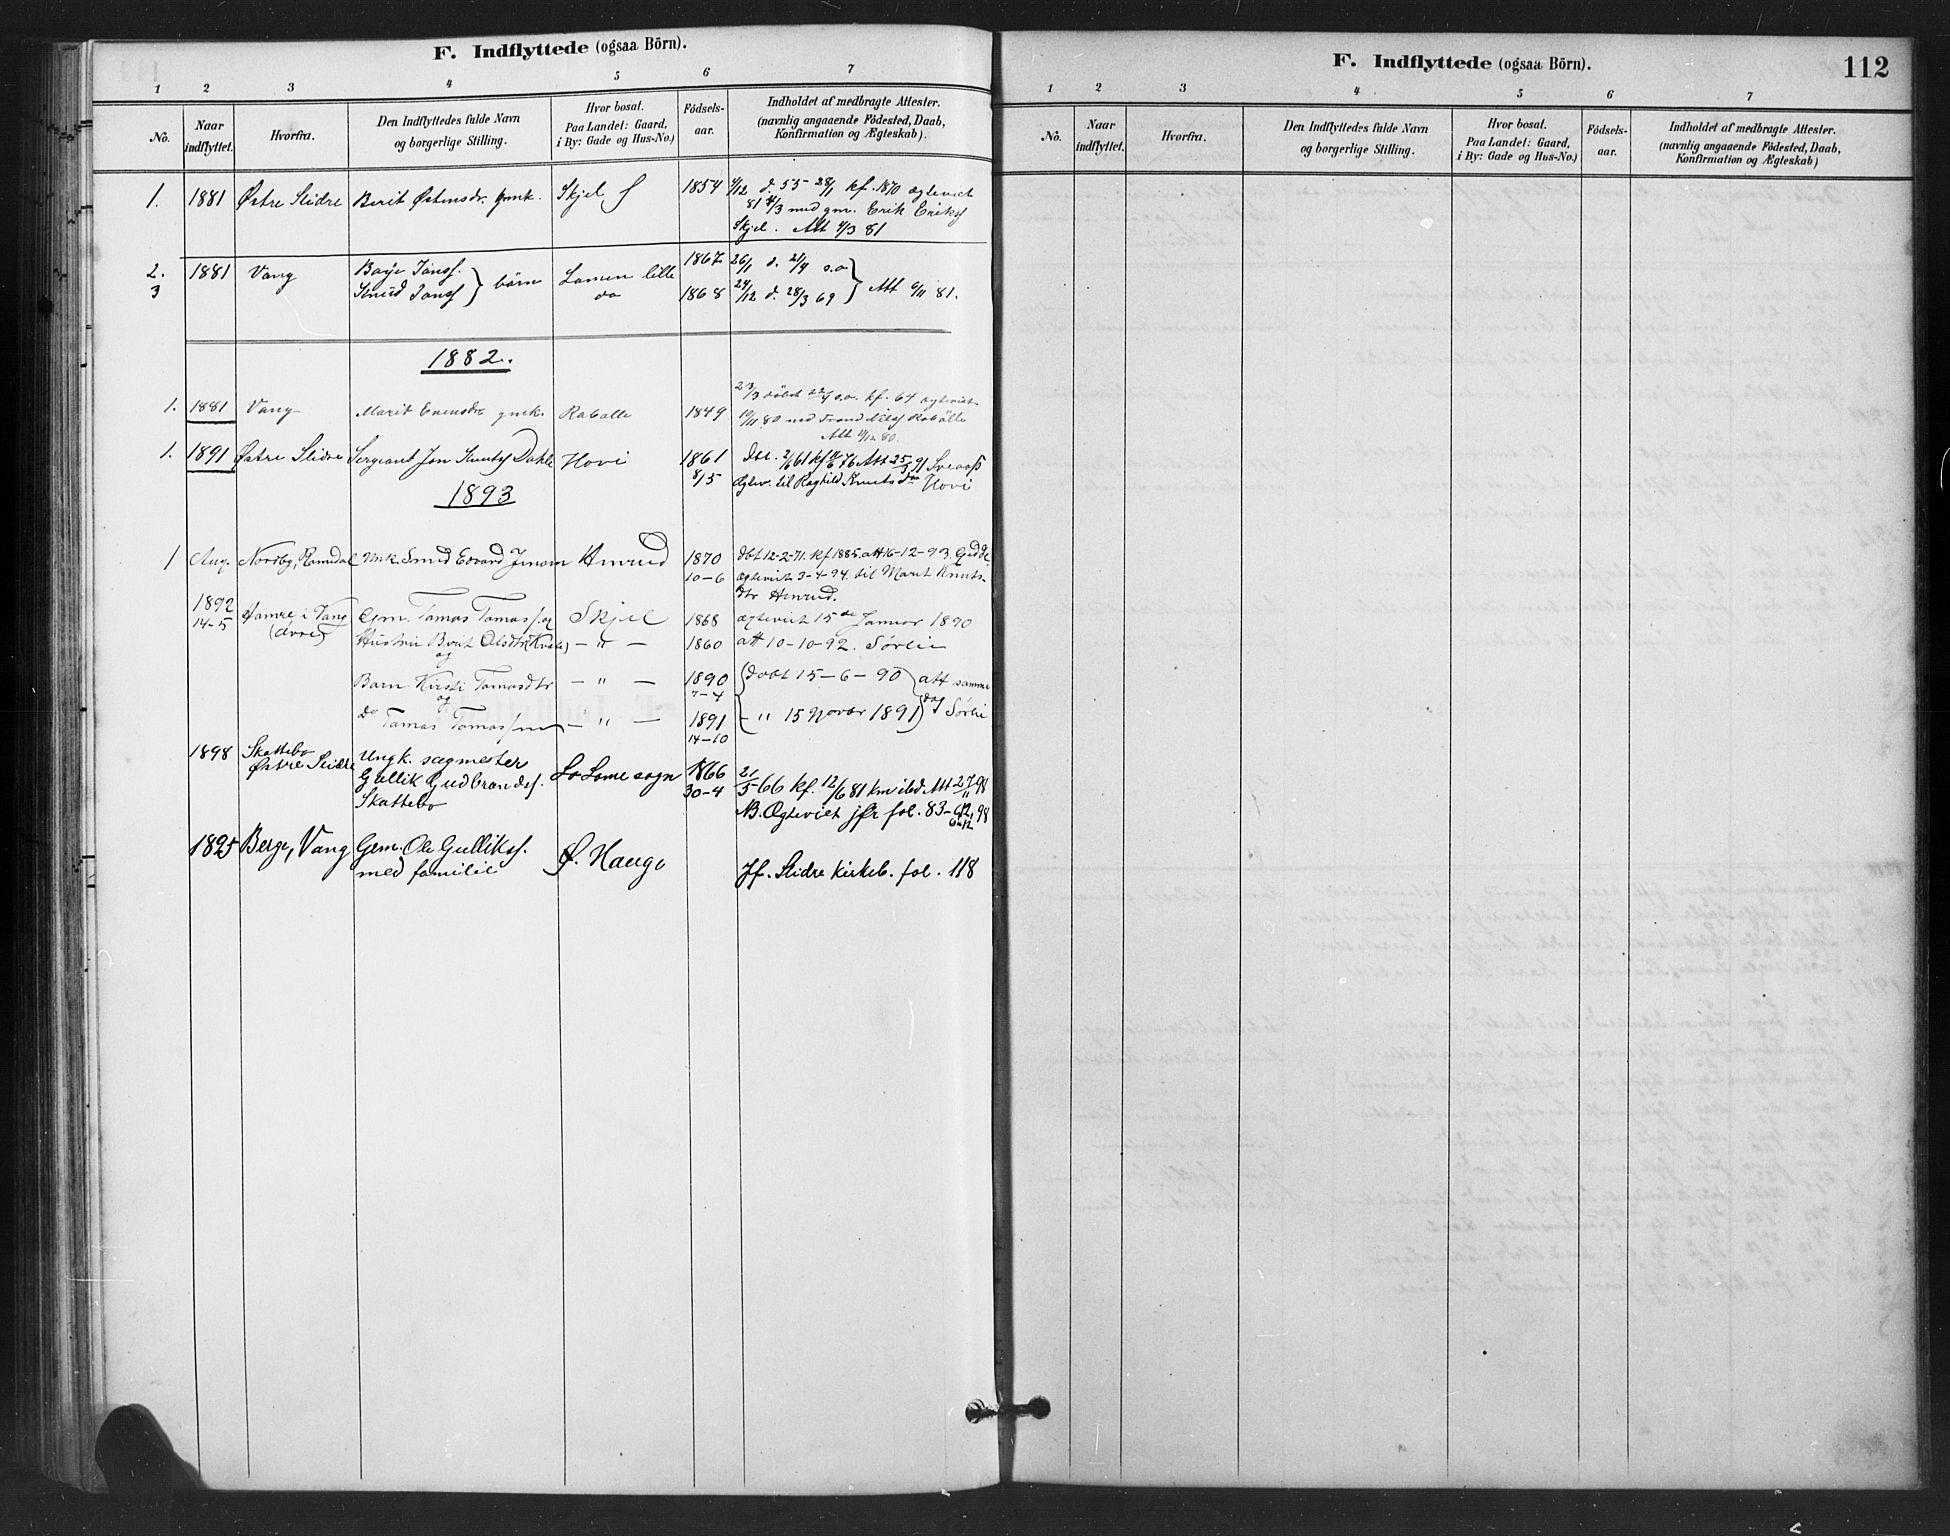 SAH, Vestre Slidre prestekontor, Klokkerbok nr. 6, 1881-1915, s. 112